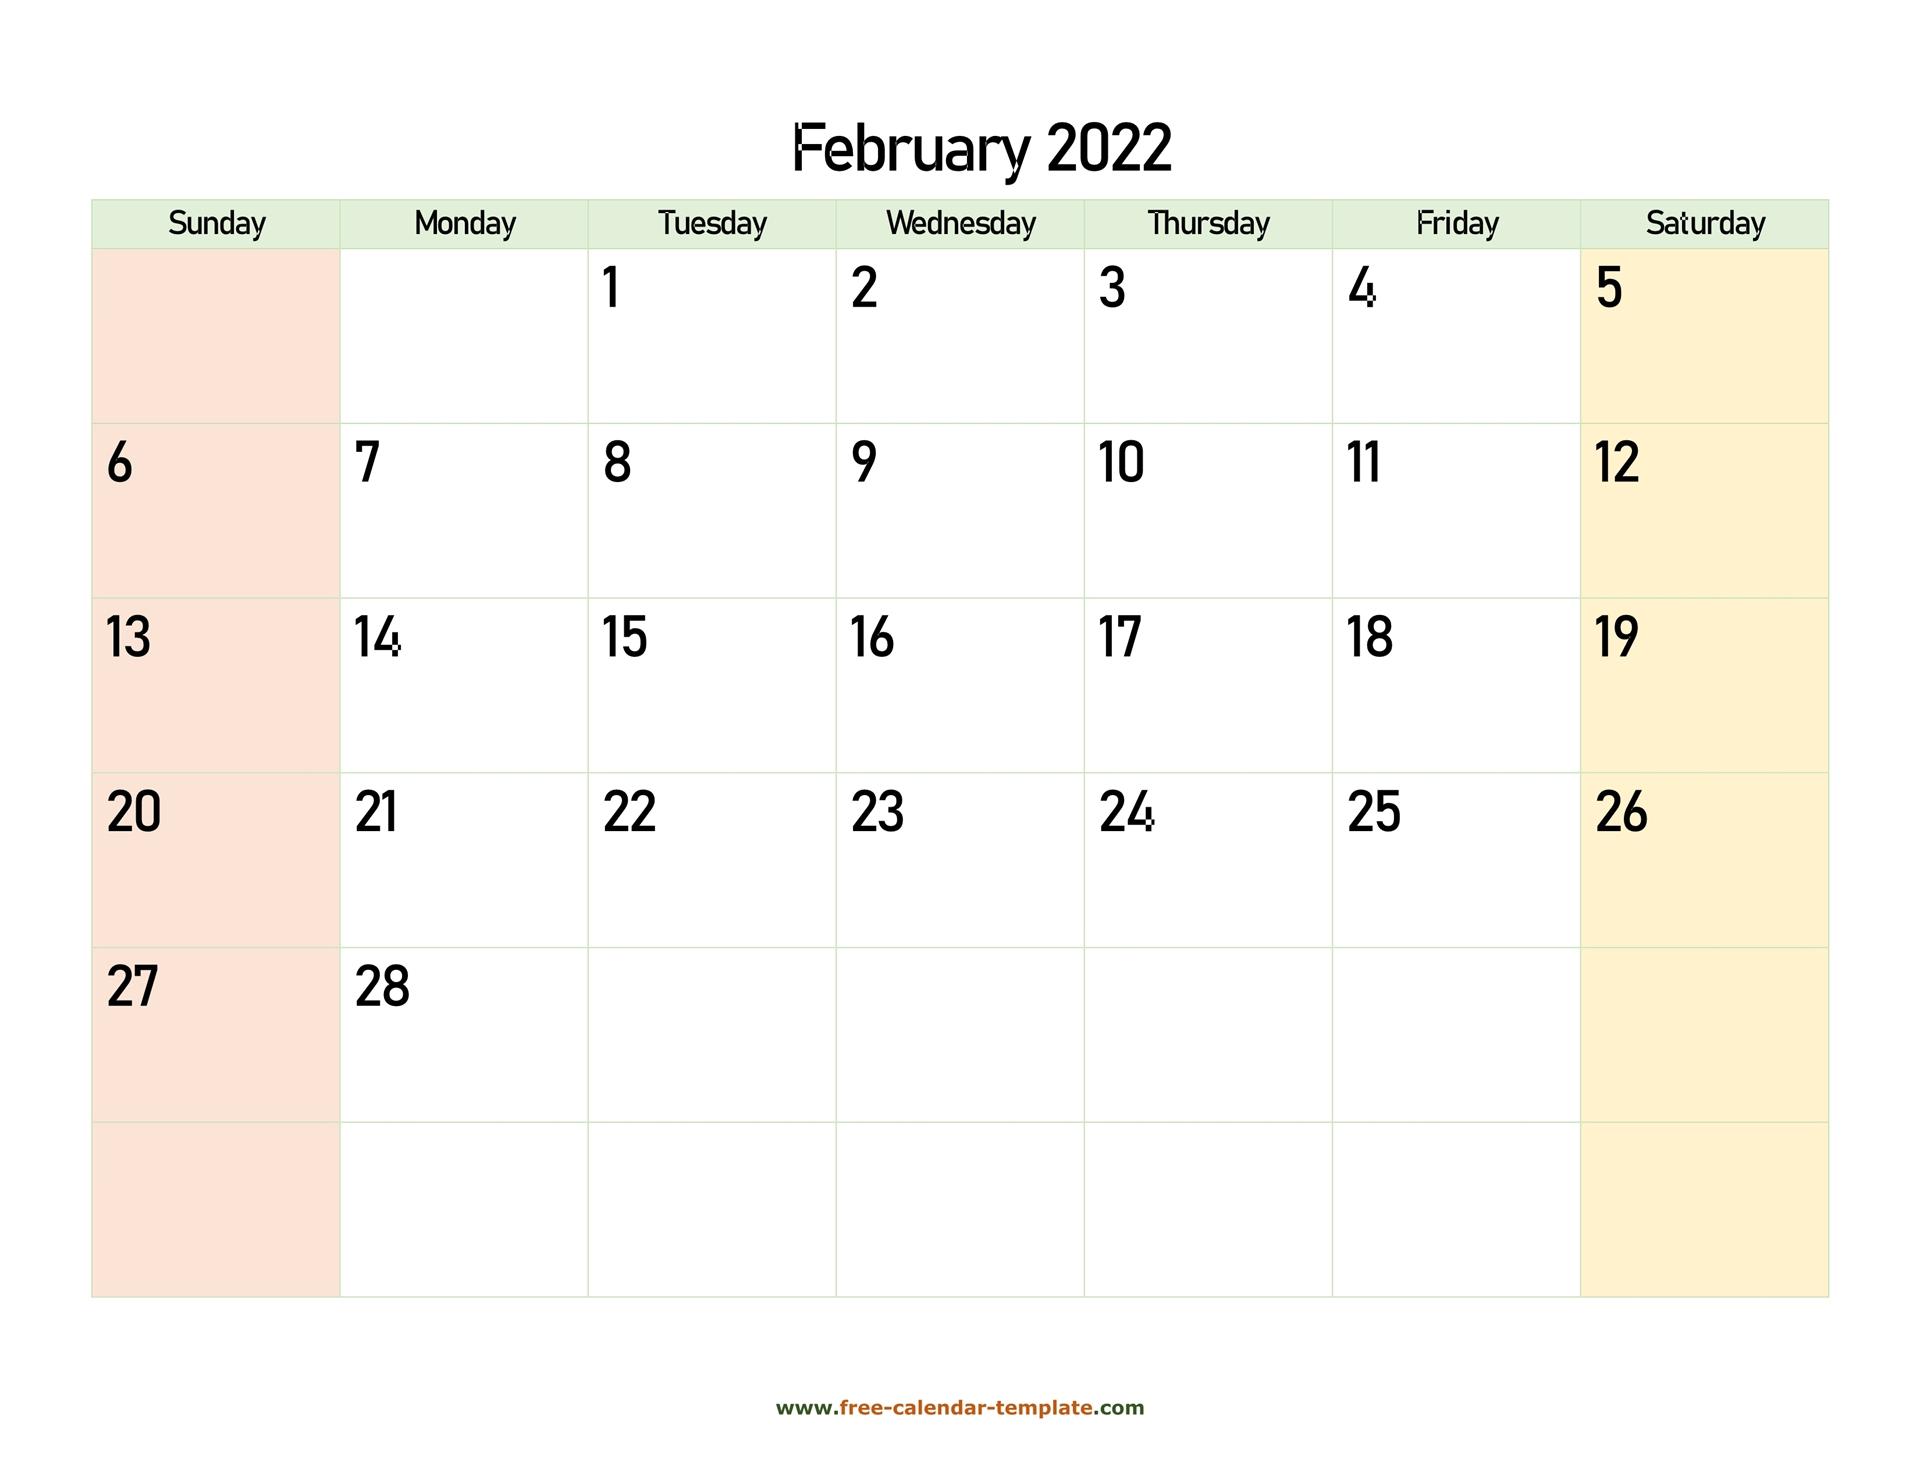 February 2022 Free Calendar Tempplate | Free Calendar Inside Printable February 2022 Calendar